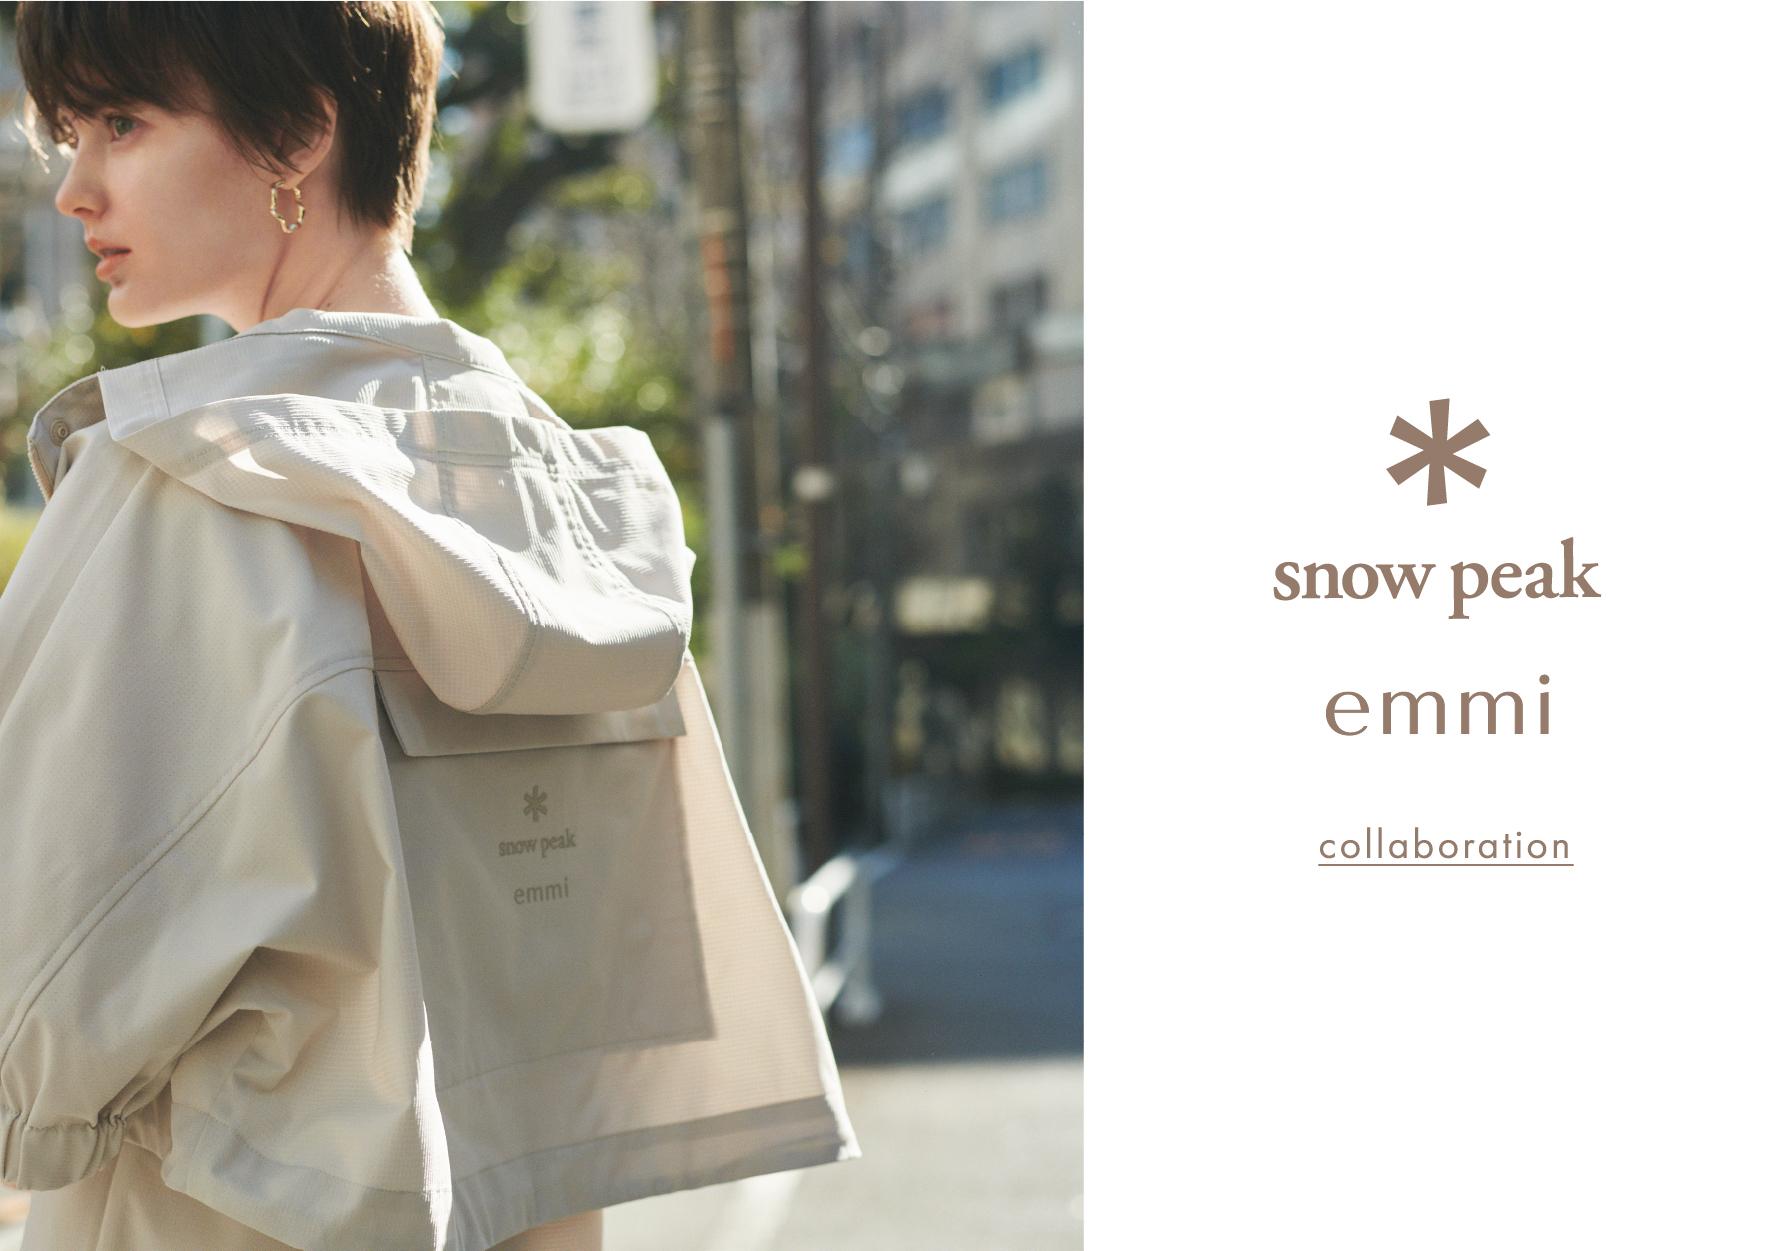 snow peak emmi collaboration